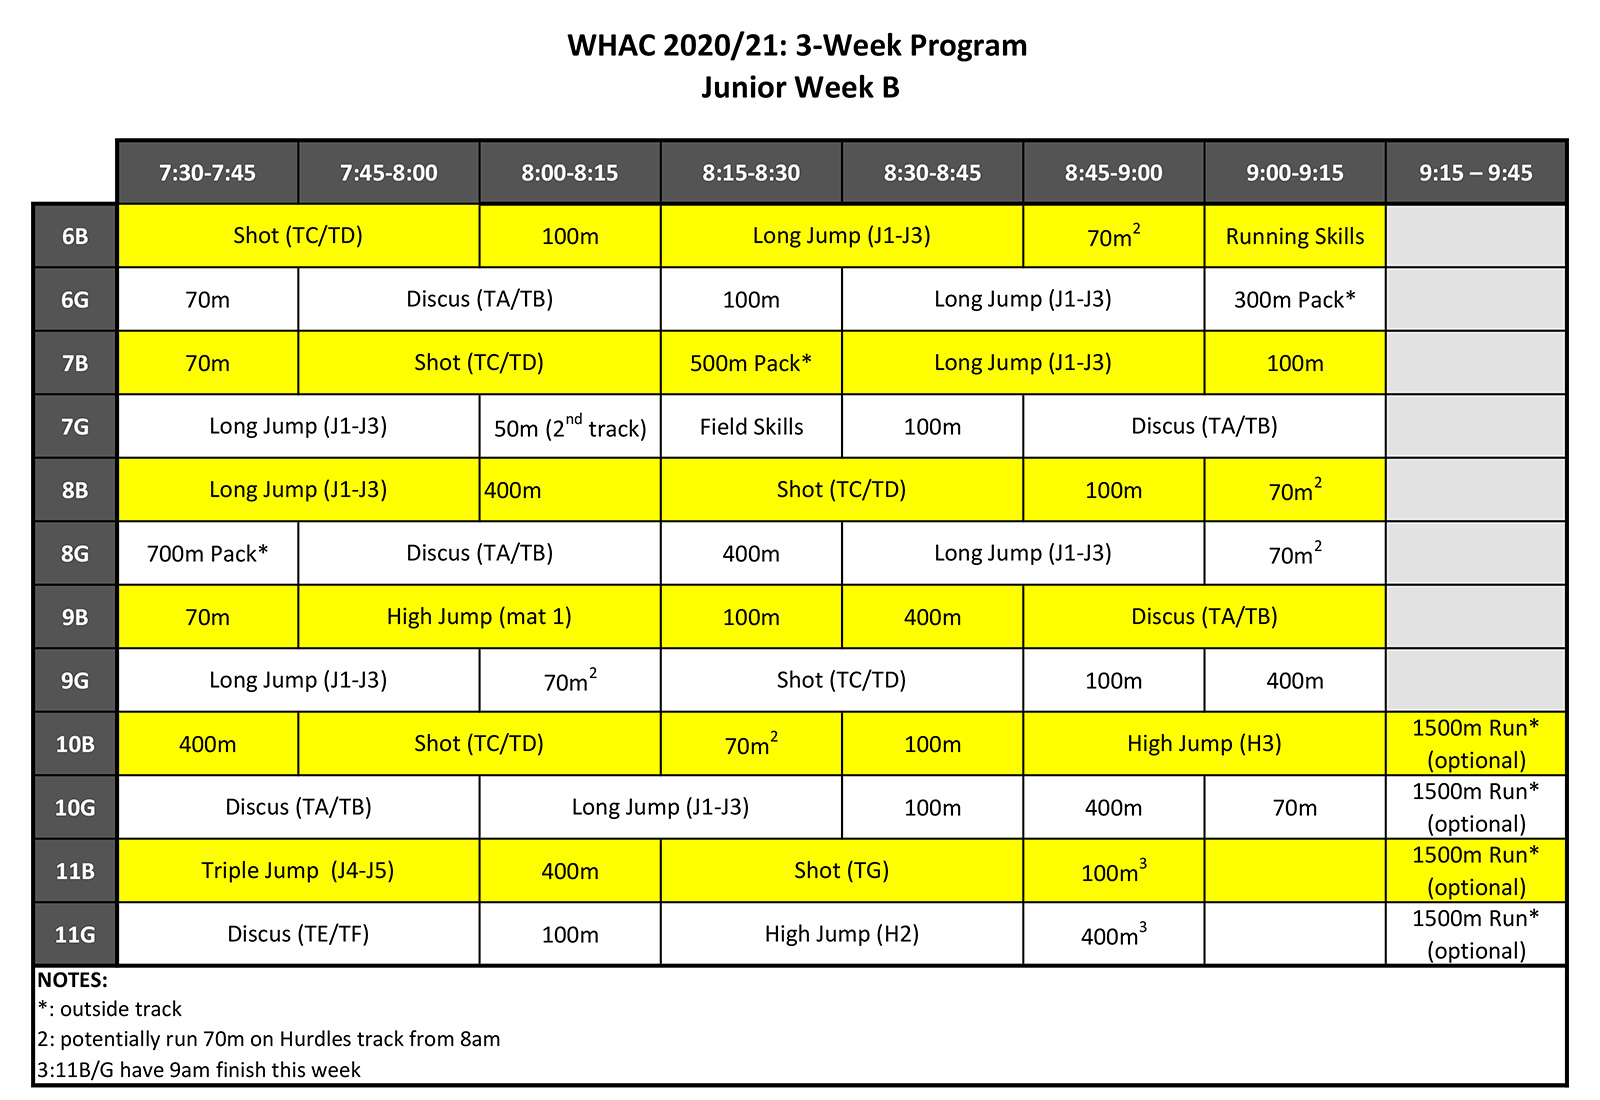 JUNIOR PROGRAM WEEK B 2020/21